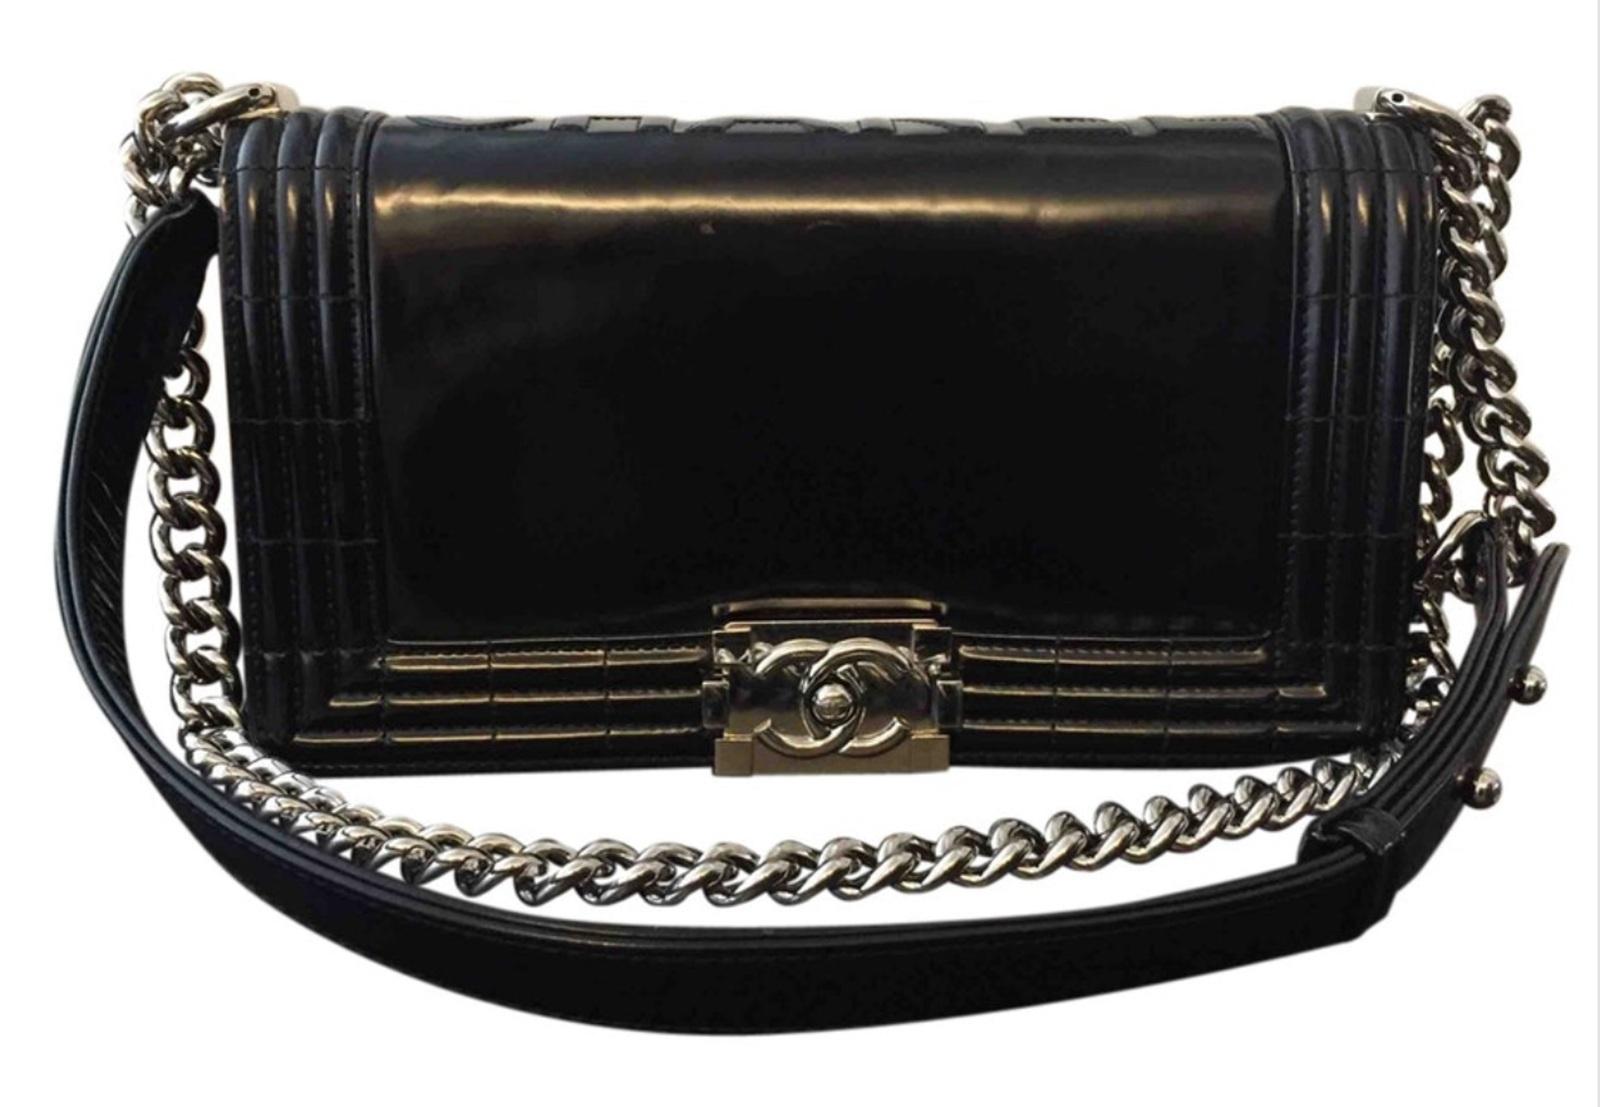 100% Authentic Chanel Black Glazed Calfskin Medium Boy Flap Bag Silver Hardware